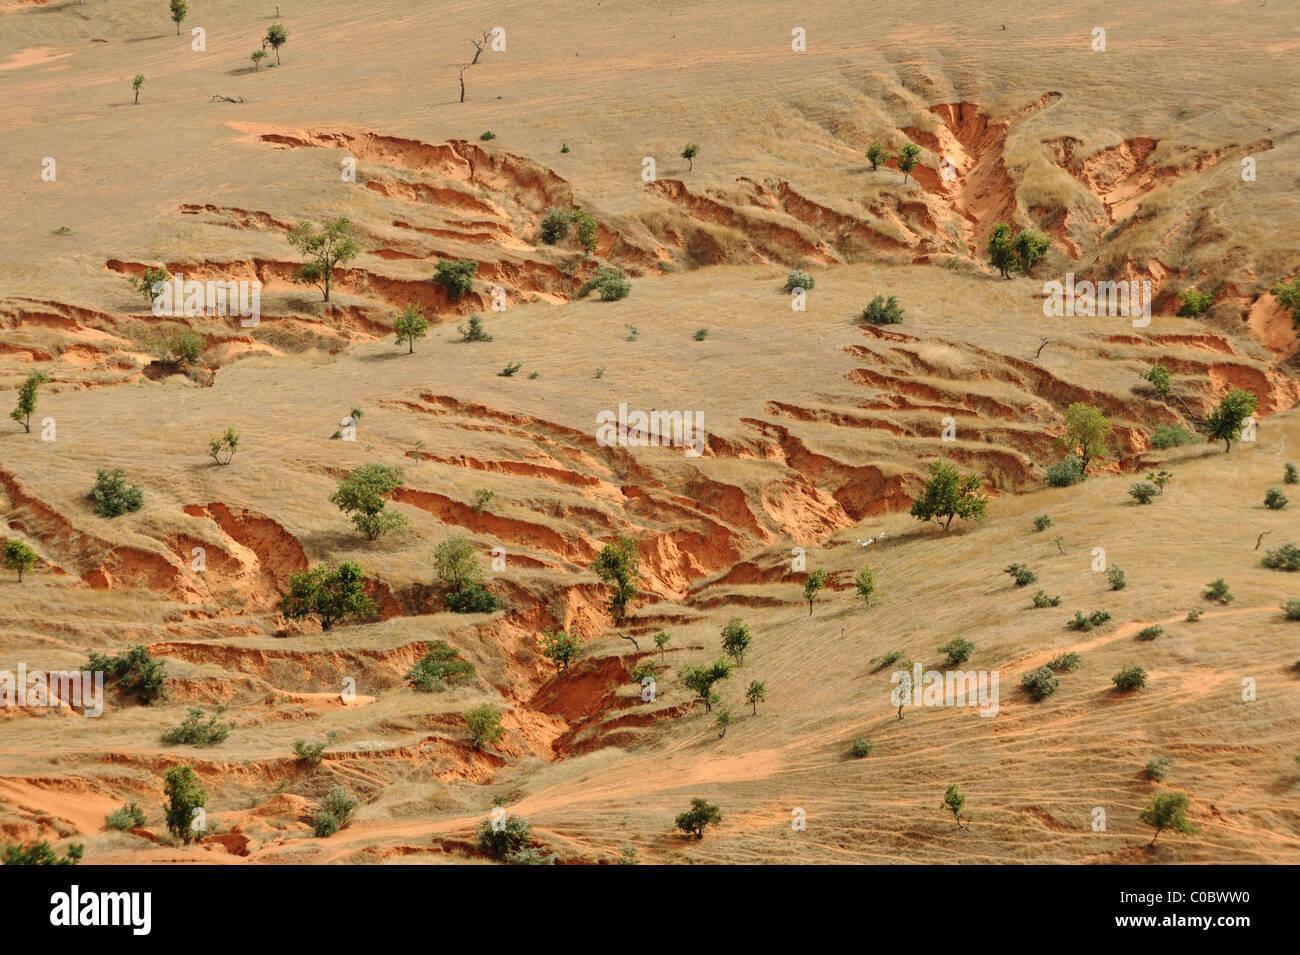 Gully erosion on the Gondo Plain, on the east side of Pays Dogon, Mali. - Stock Image